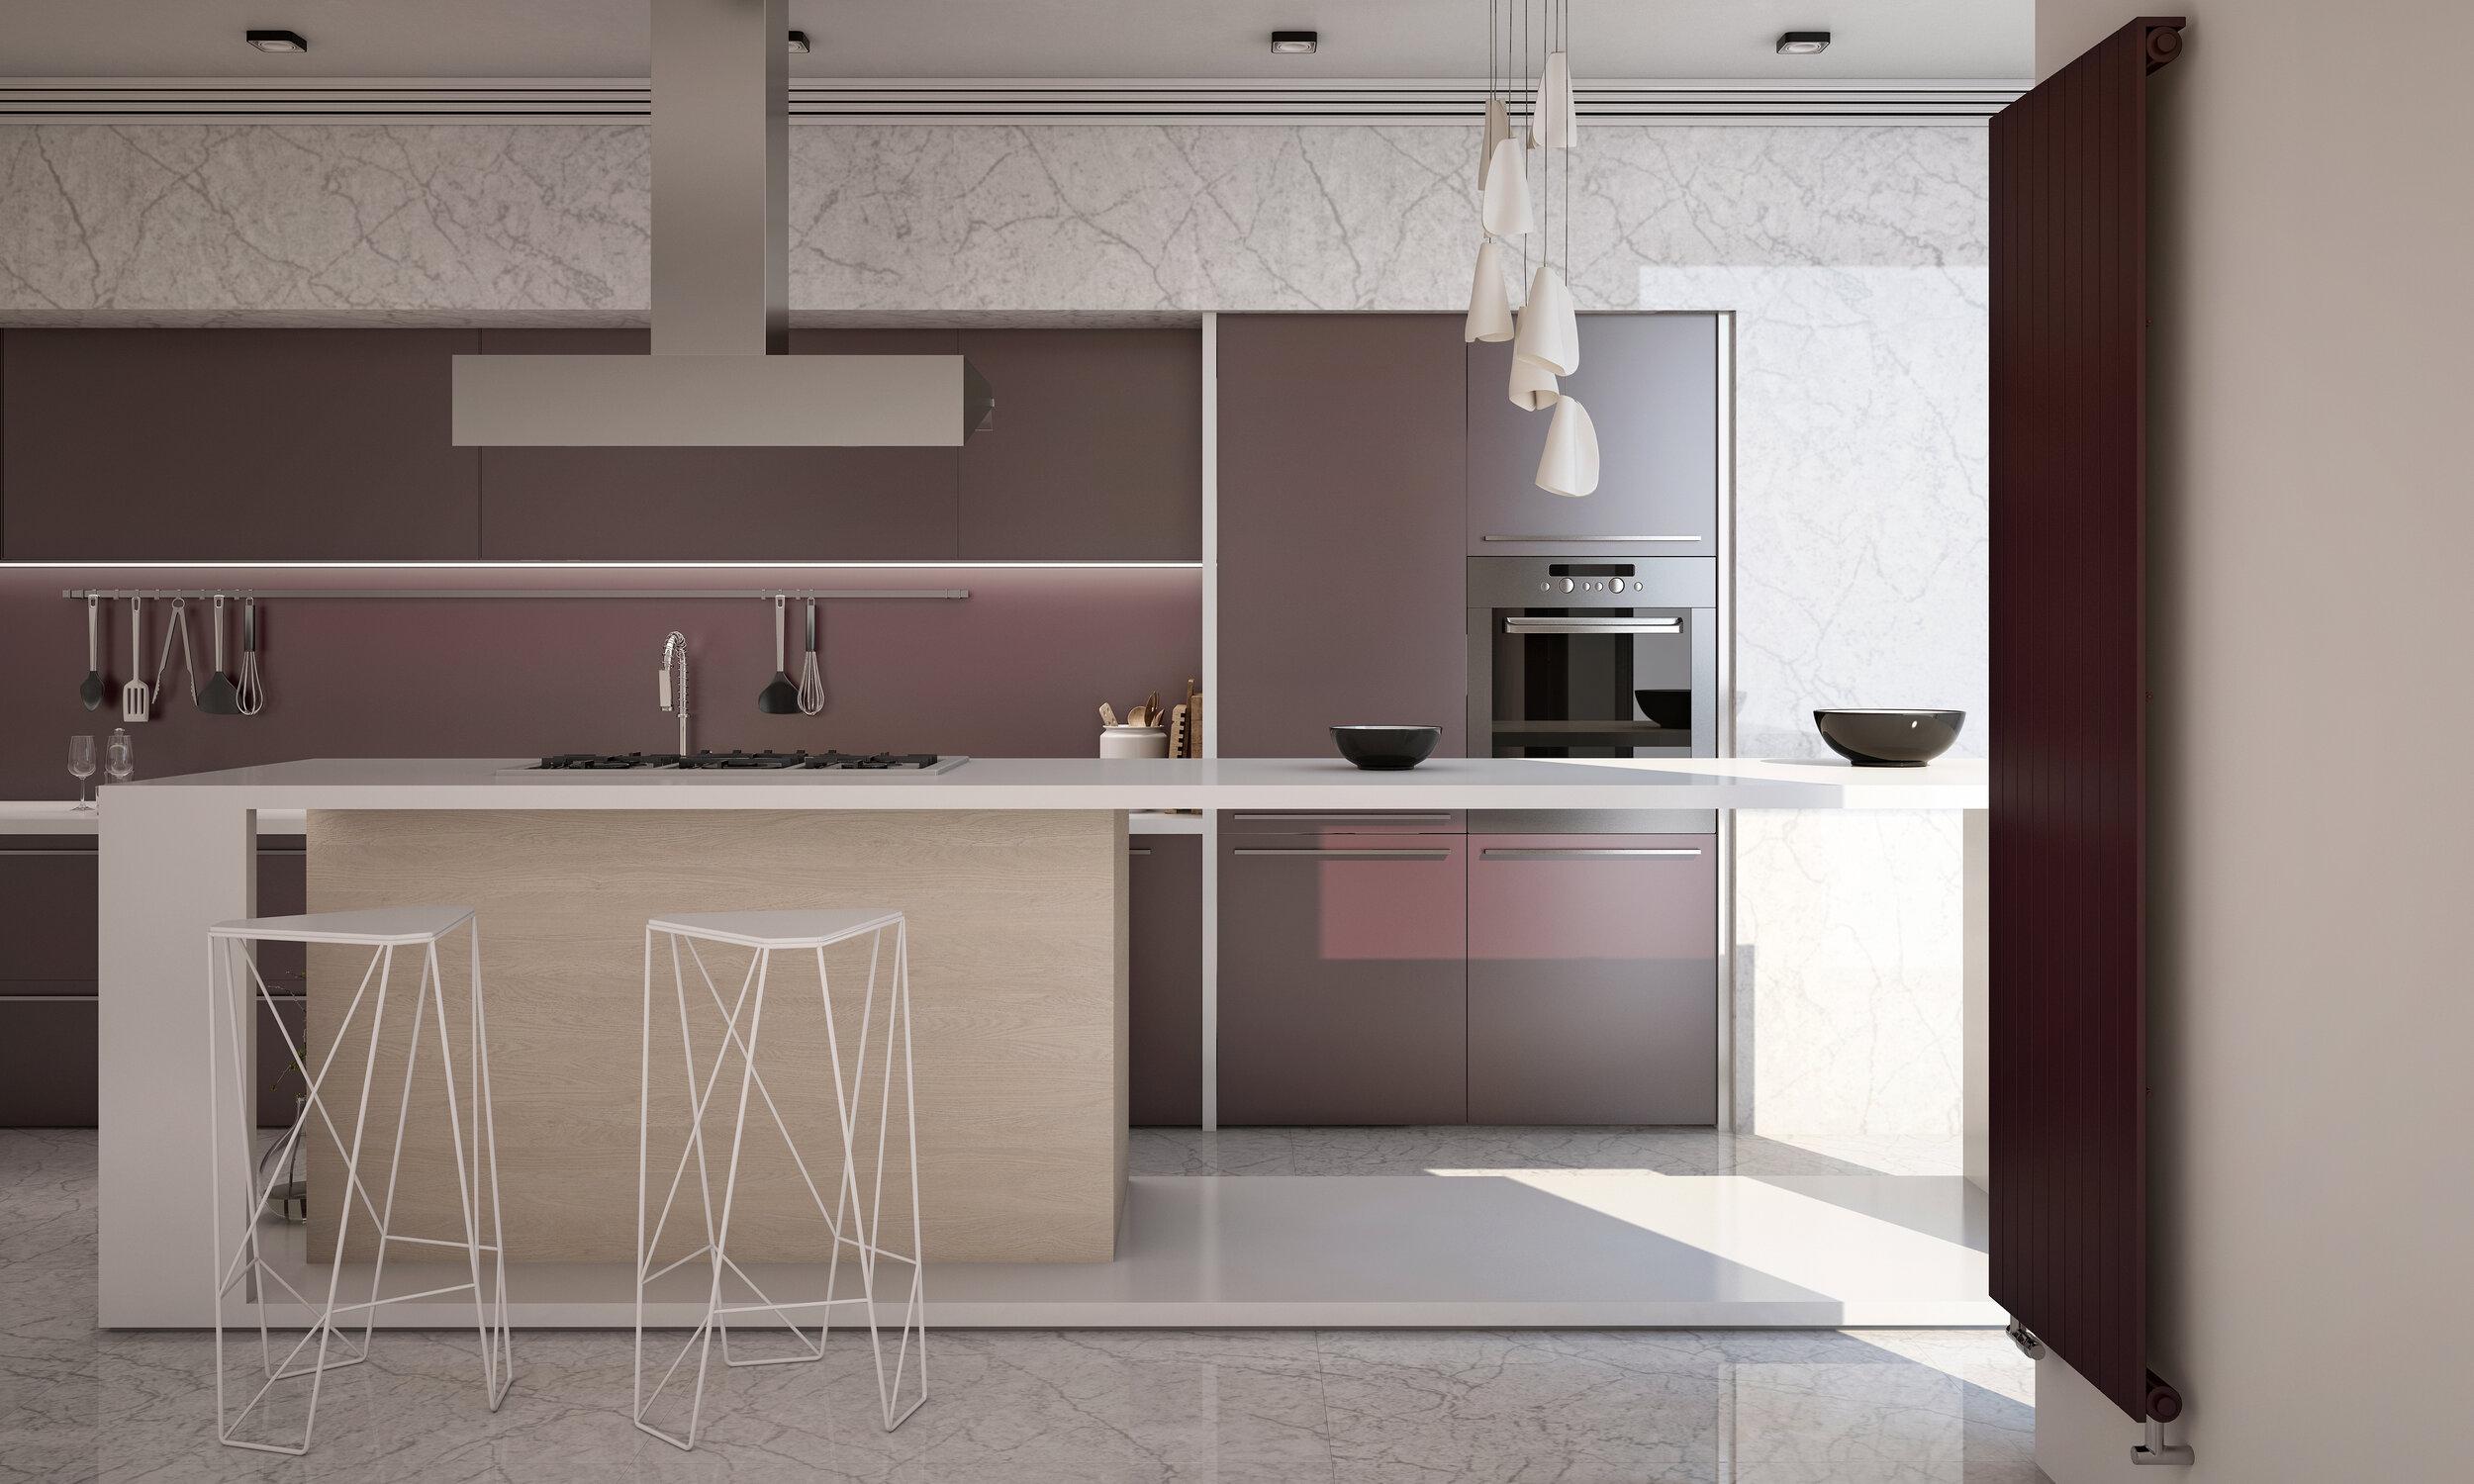 kitchen-renovations-miami-kitchen-remodel-miami